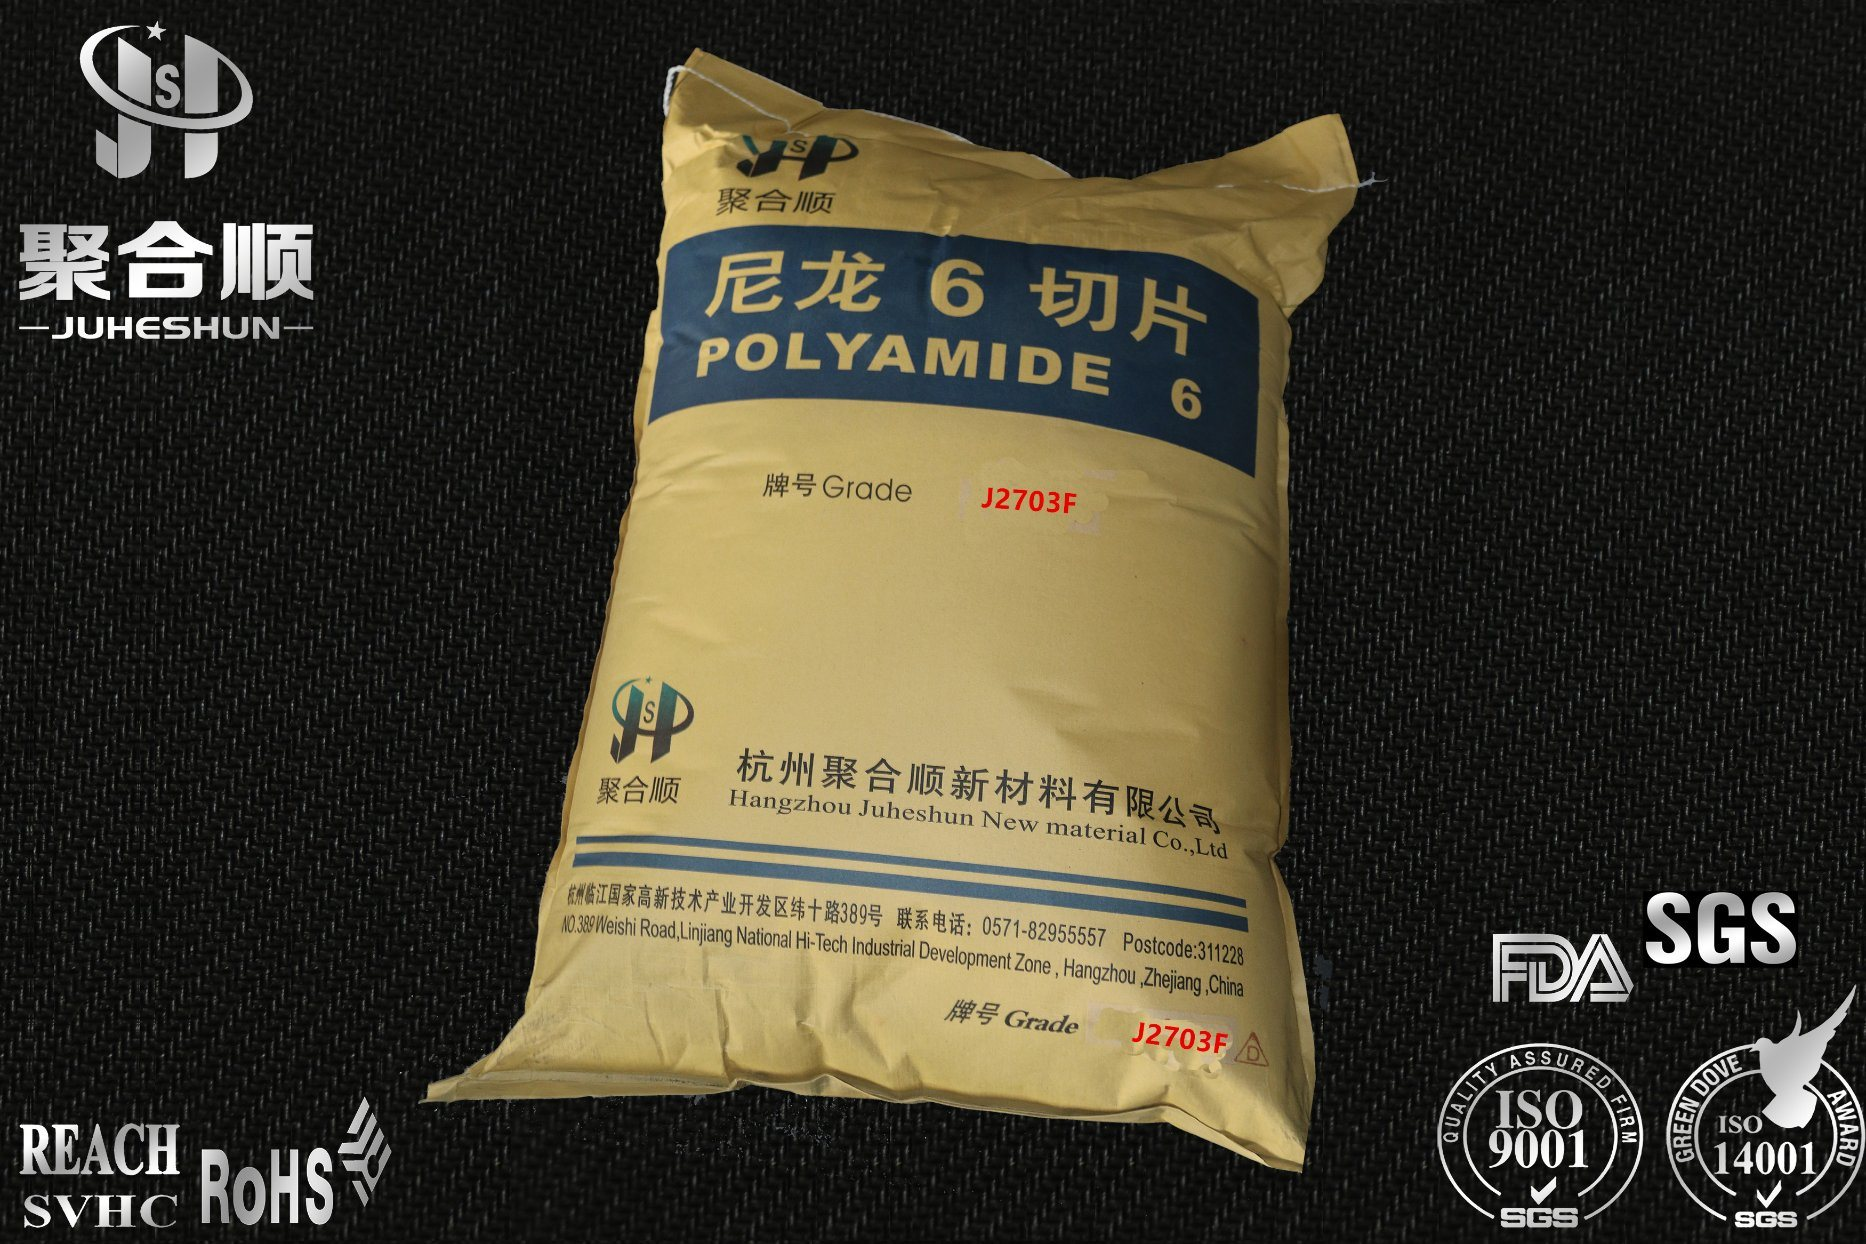 J2703f/Civilian High Speed Spinning Grade PA6/Nylon 6 Granules/Polyamide 6 Chips/Granules